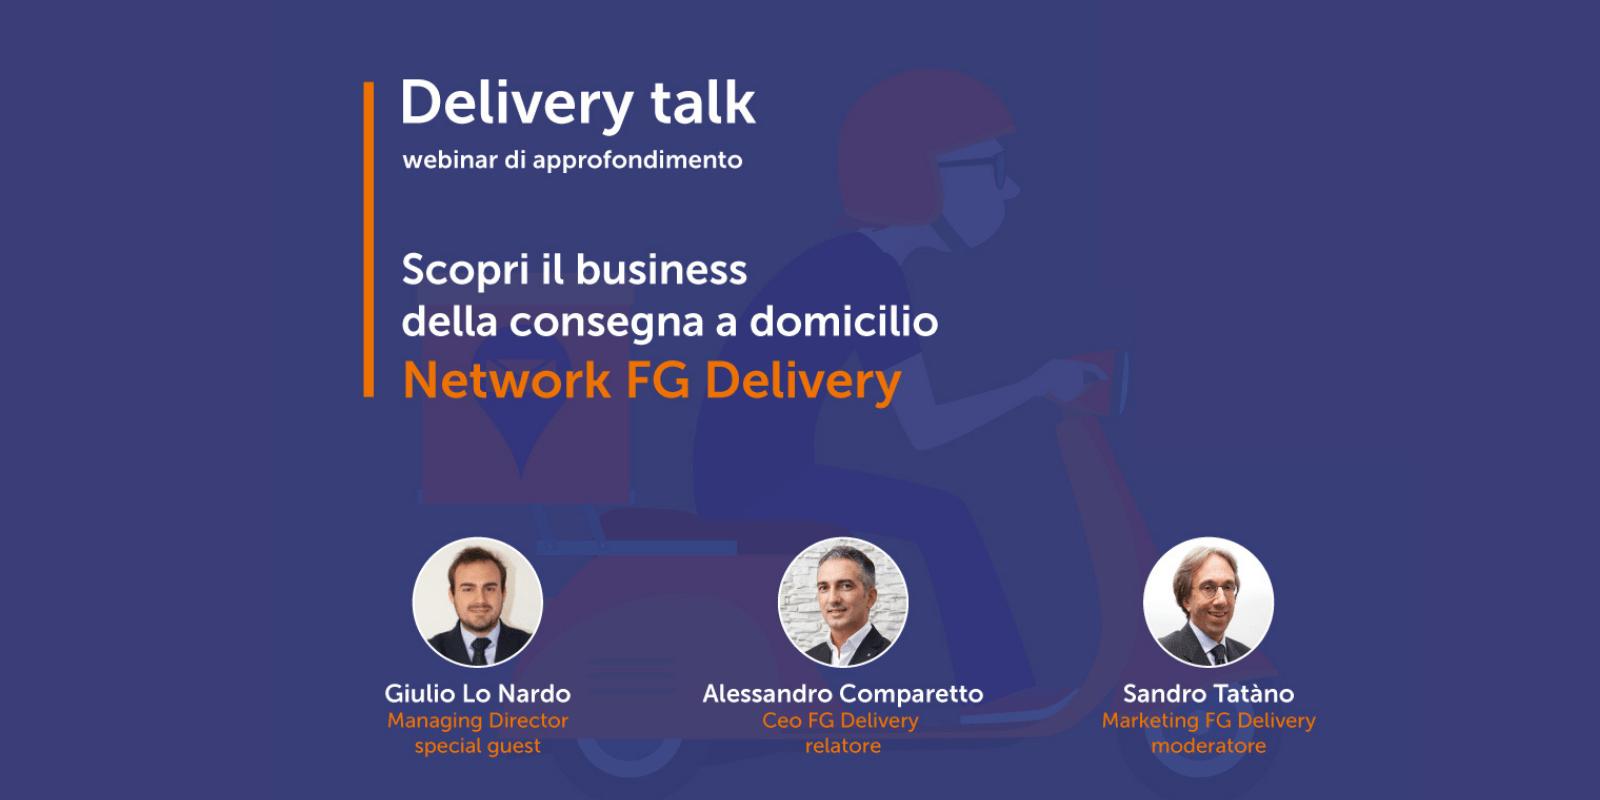 Delivery Talk Dedicato Al Network FG Delivery